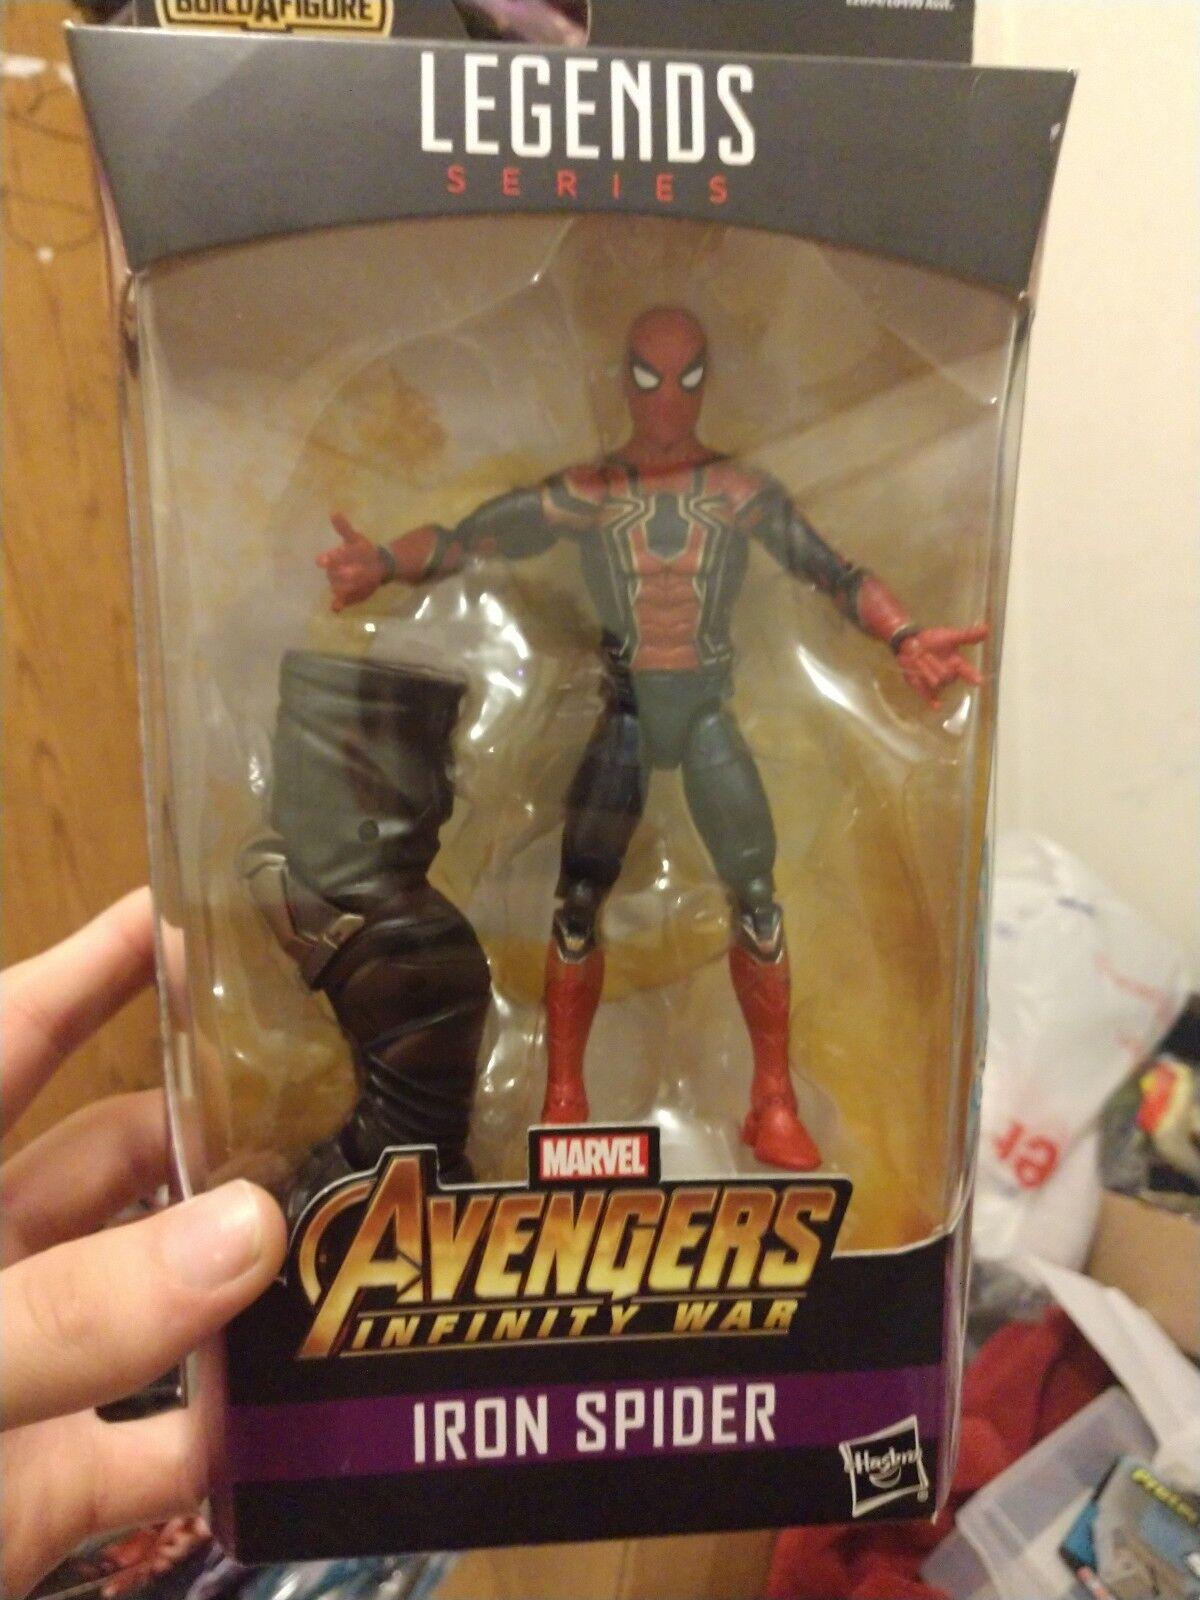 Marvel Legends Series Series Series Avengers Infinity War Iron Spider 6-Inch Figure NEW IN BOX b388ee